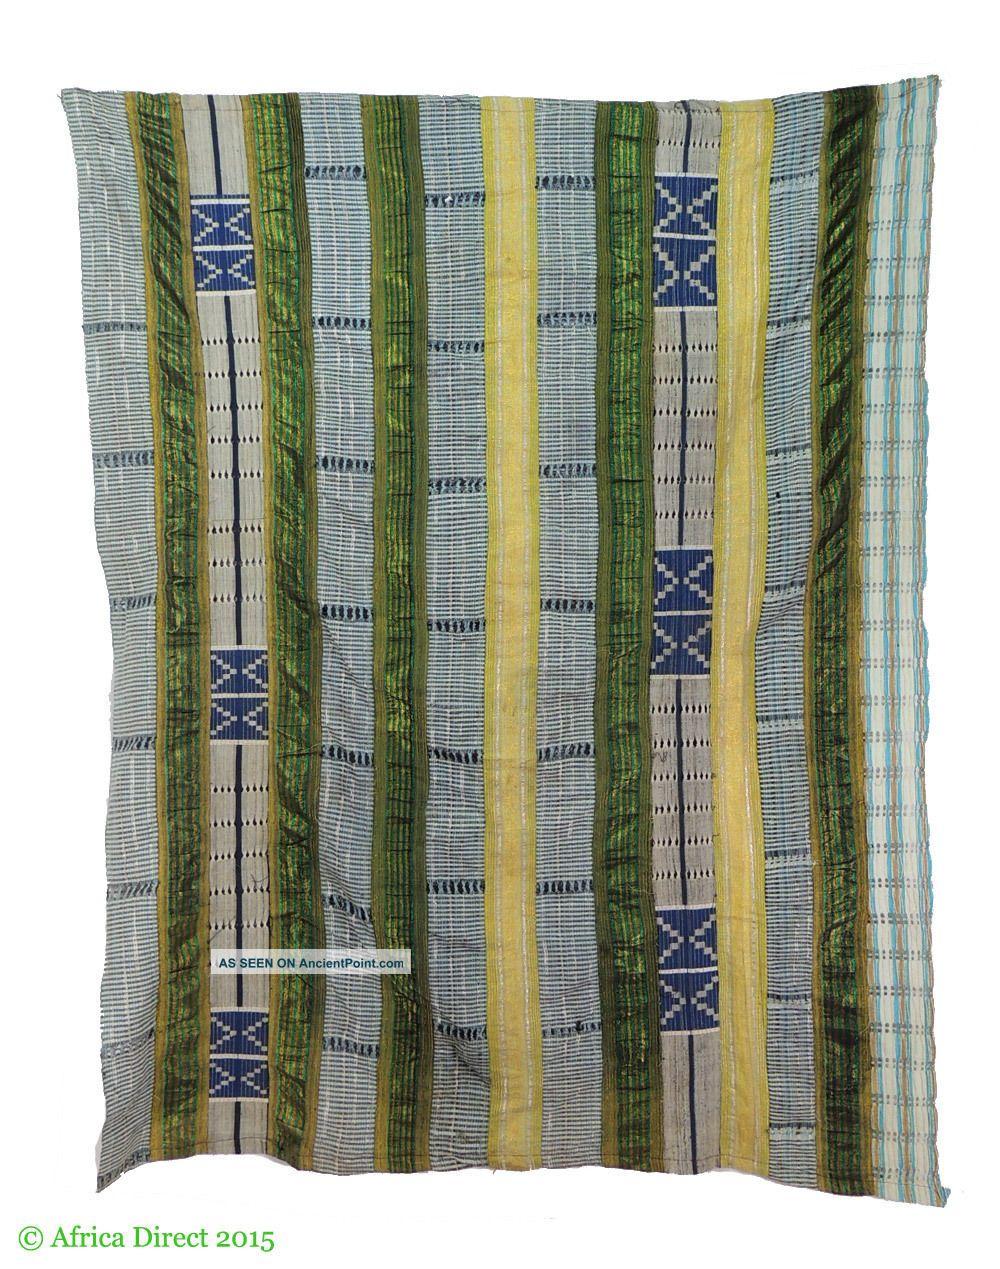 Yoruba Aso Oke Handwoven Textile Openwork Nigeria Africa Other photo